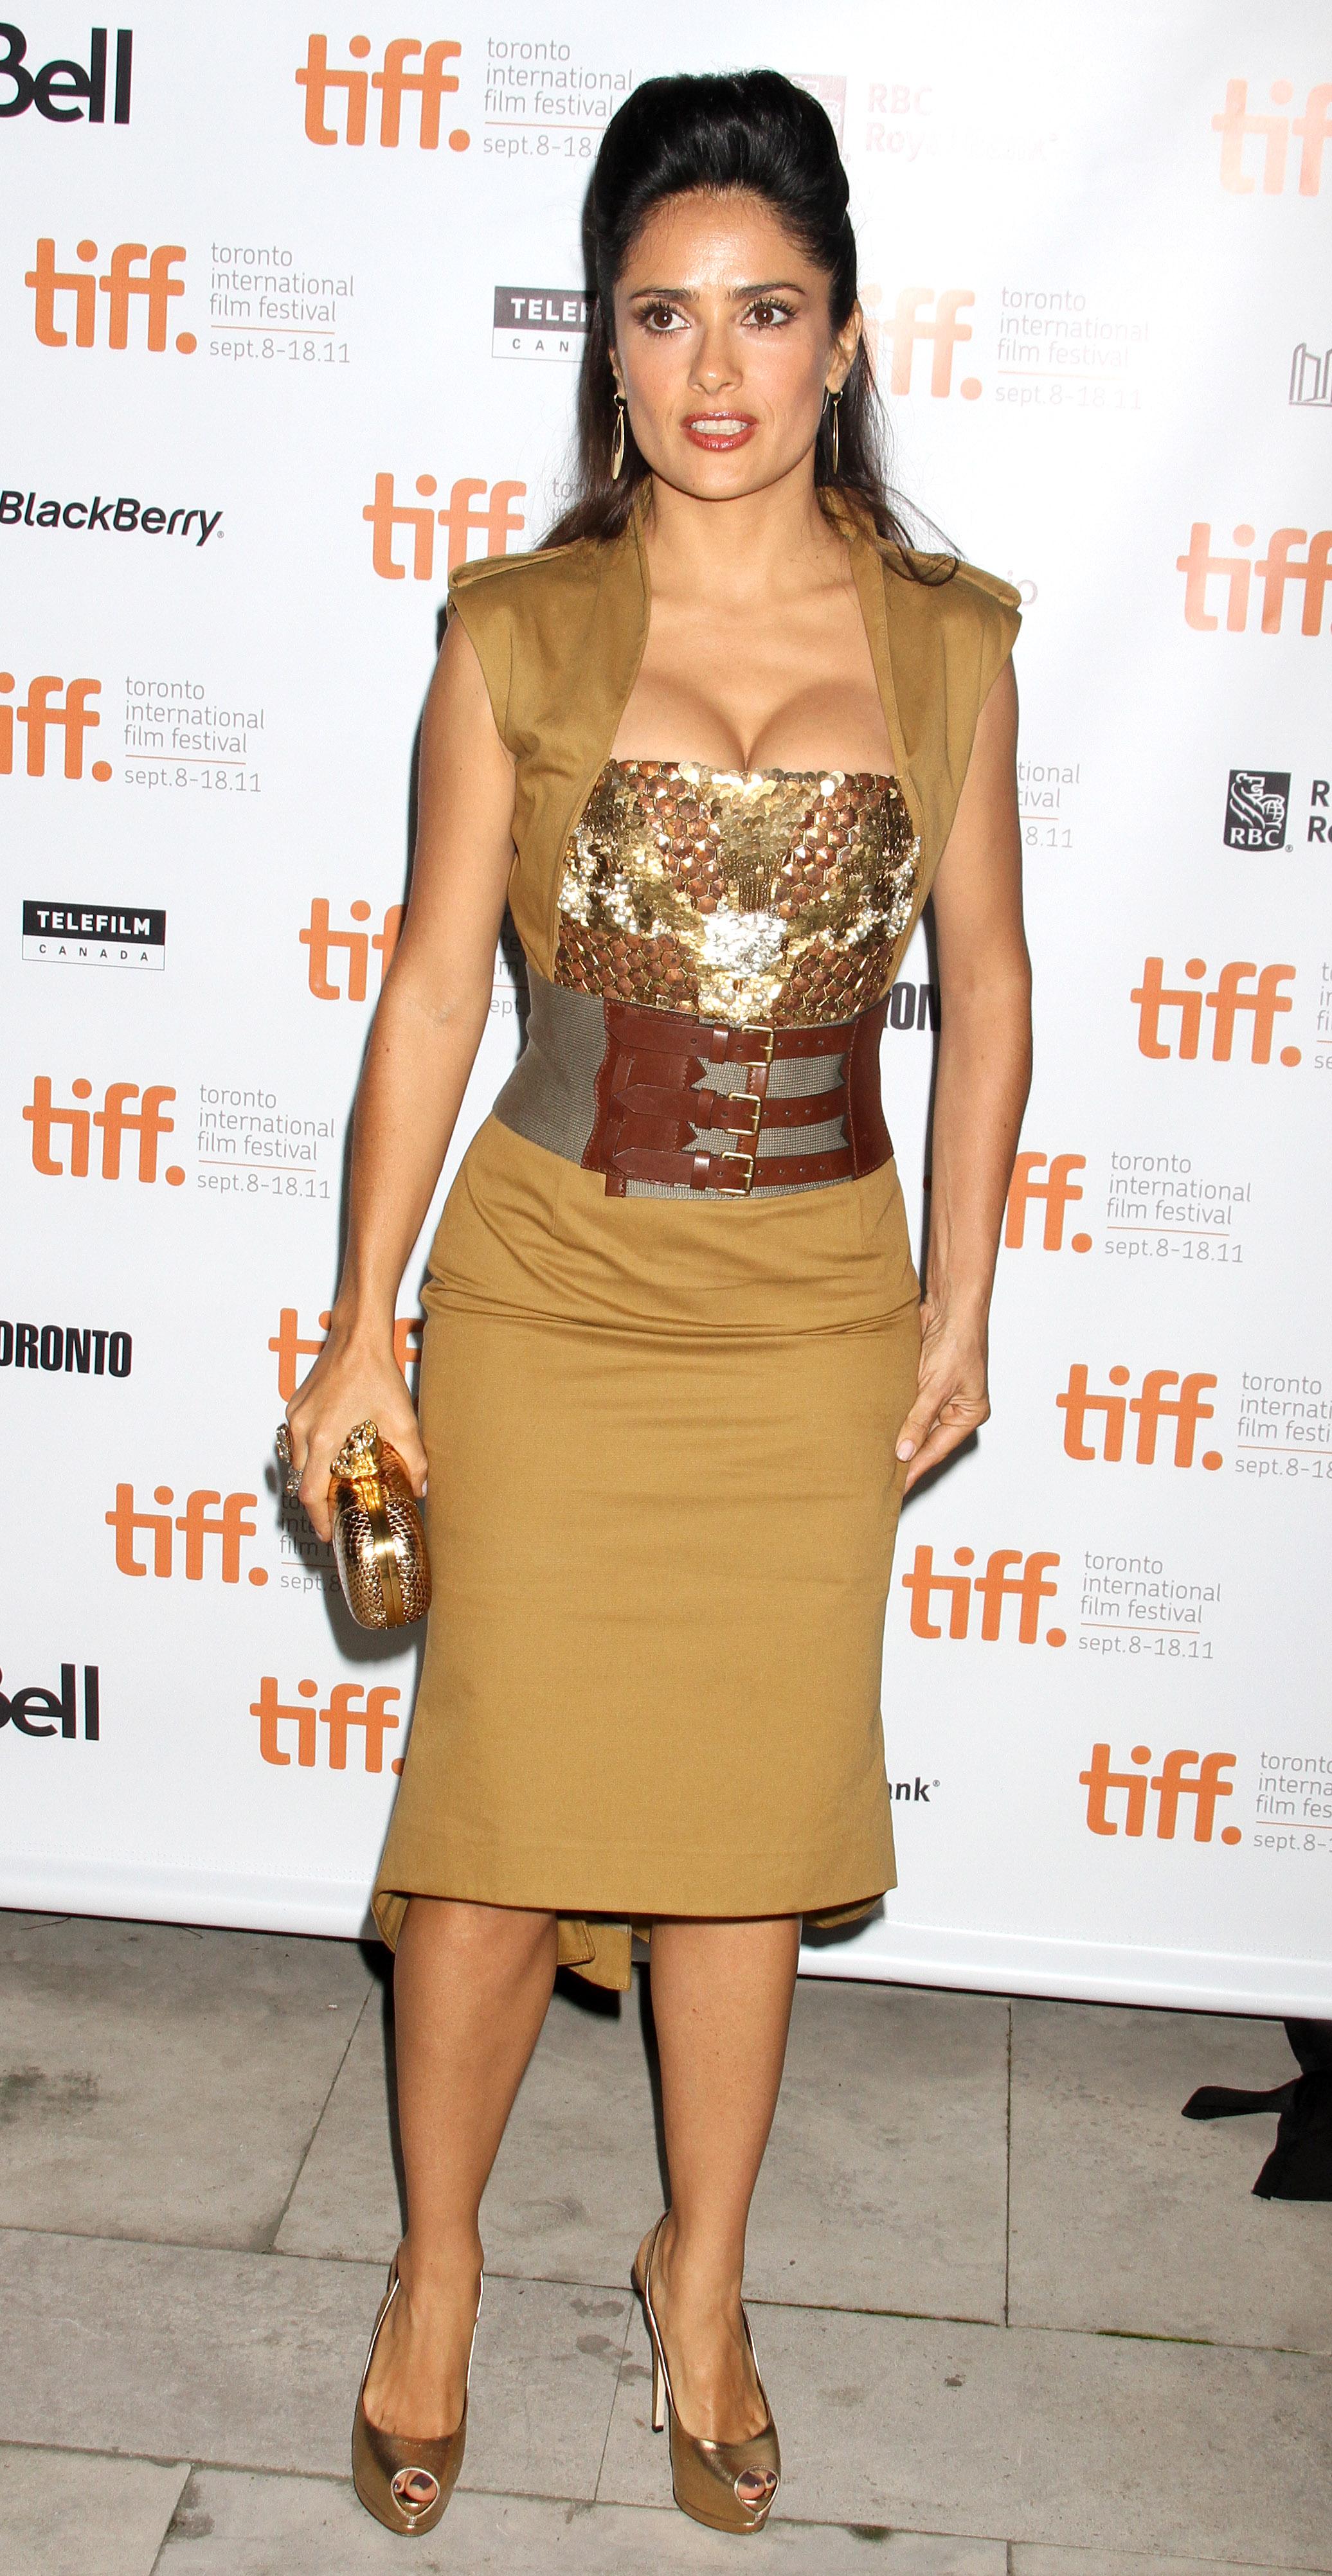 'Americano' Premiere at the Toronto International Film Festival